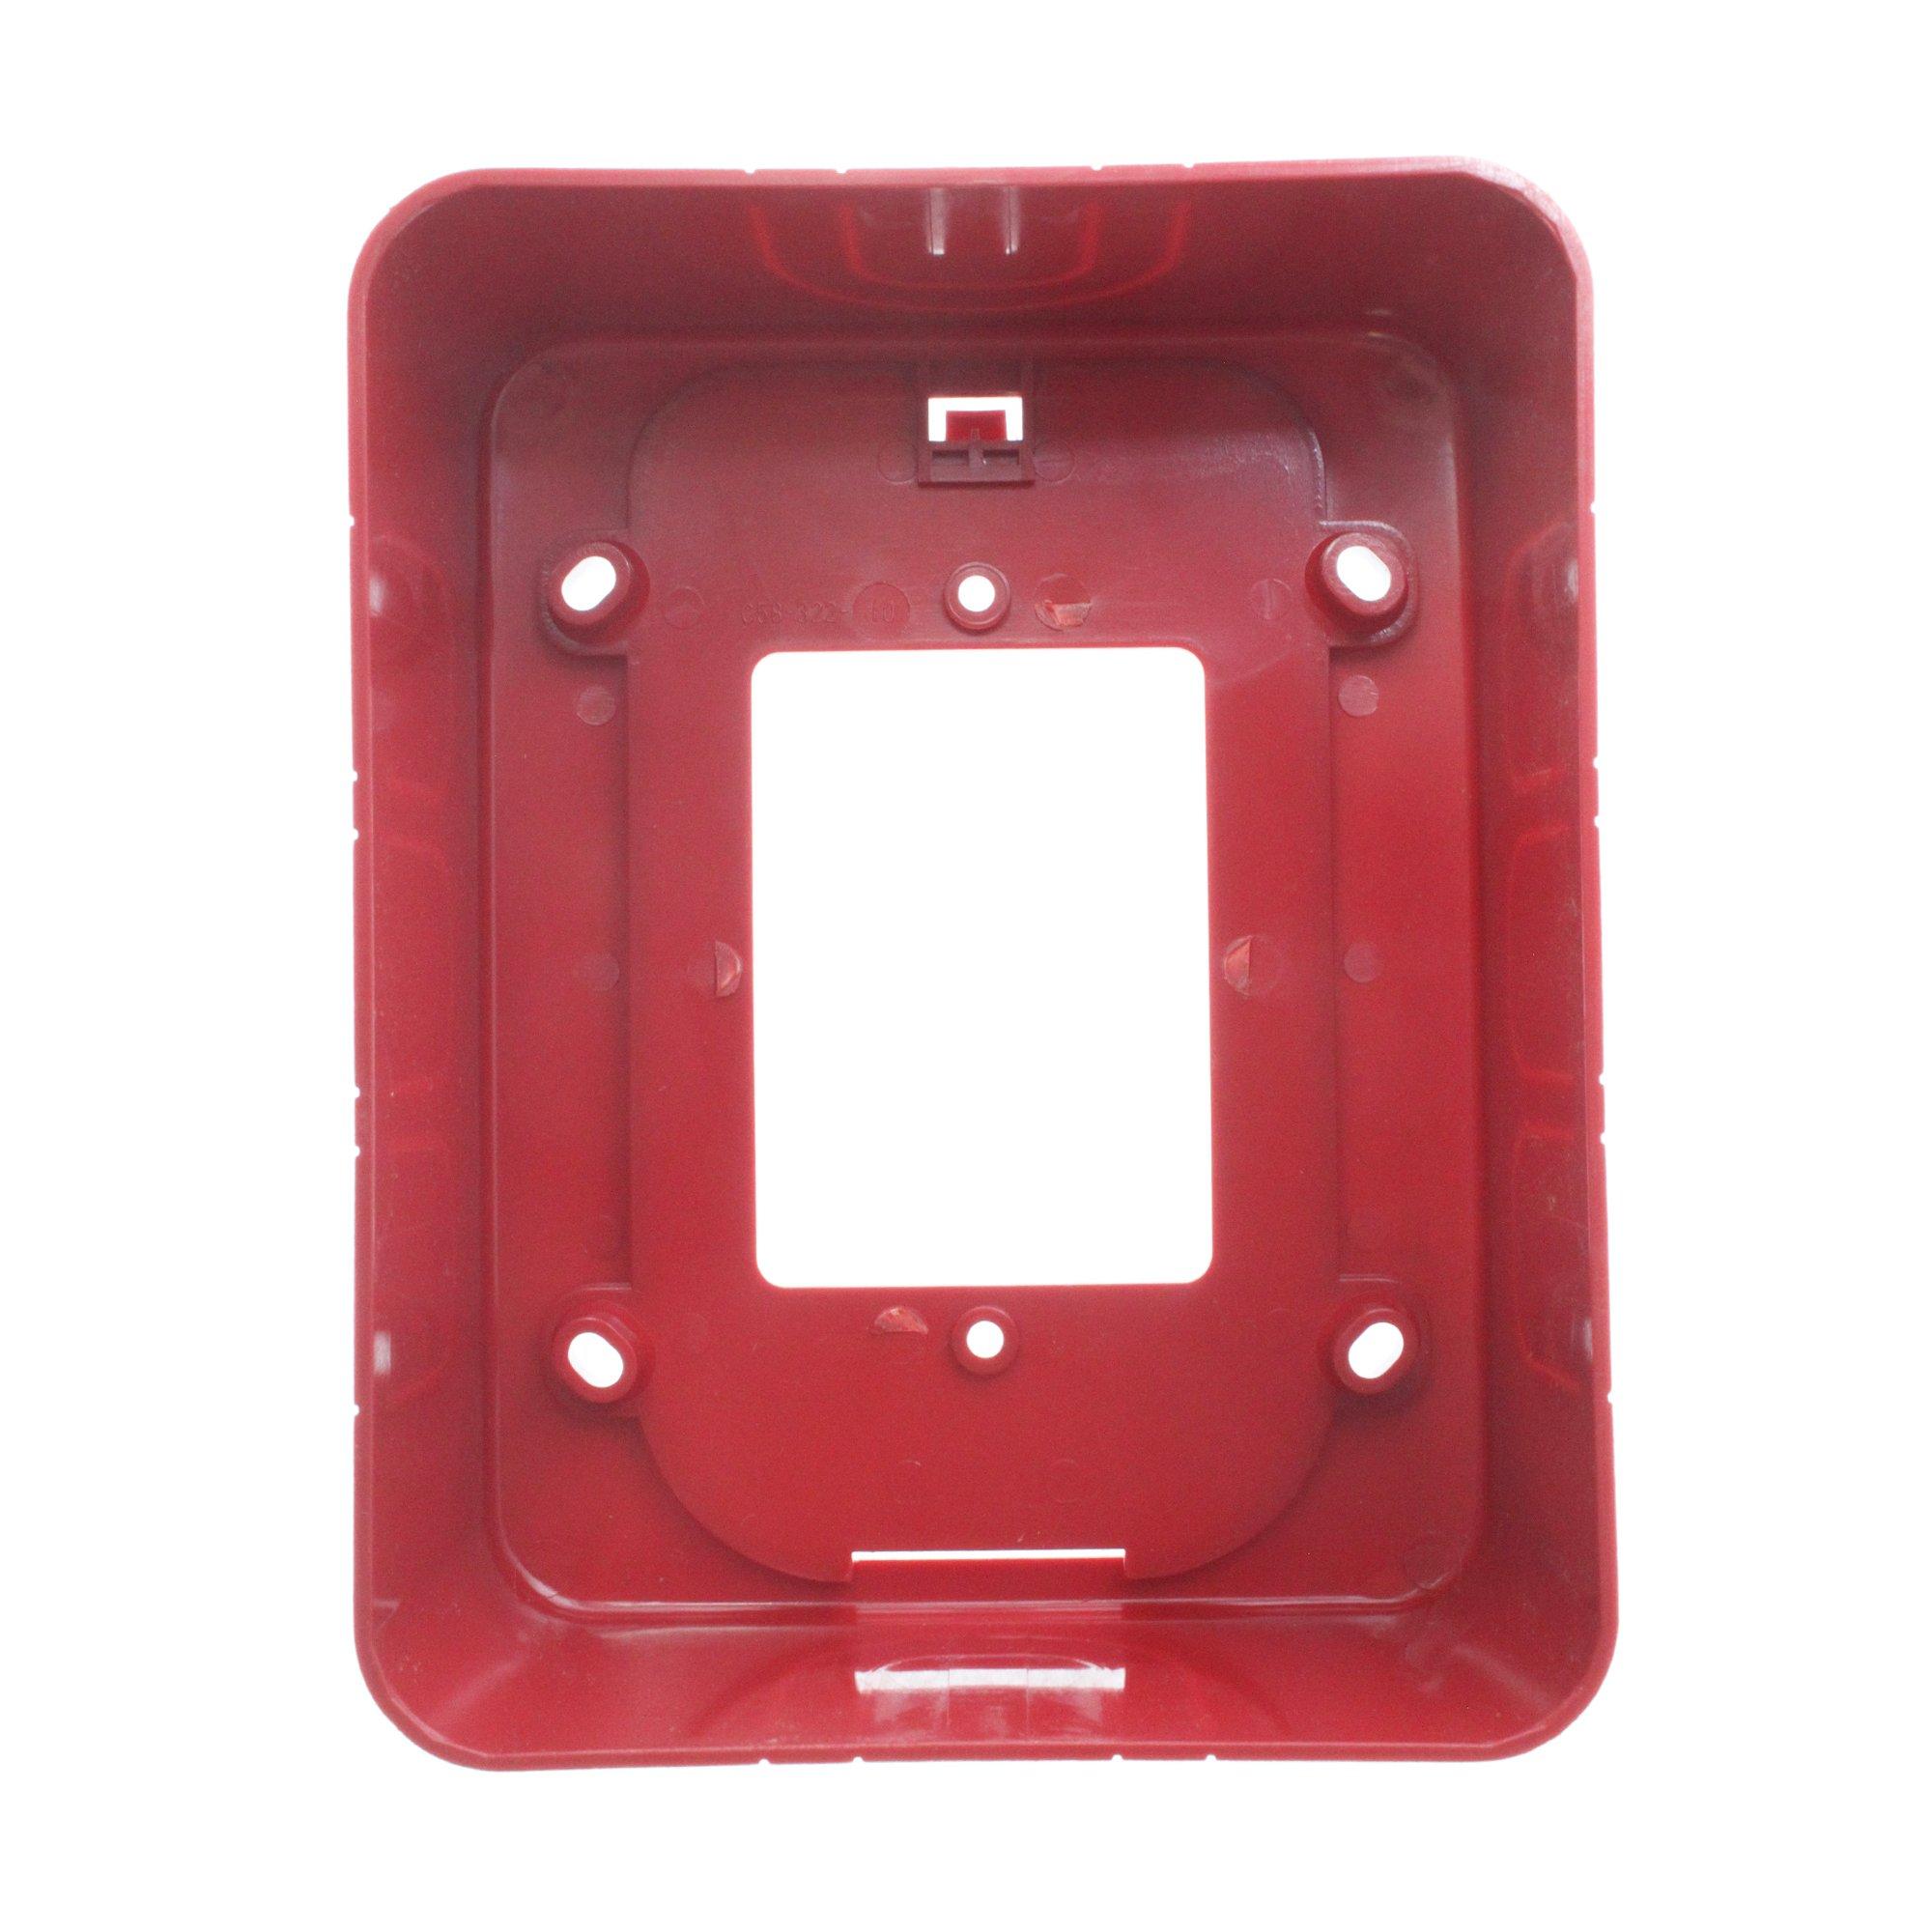 System Sensor BBS SpectrAlert Advance Alarm Wall Mount Back Box Skirt, Red by System Sensor (Image #3)